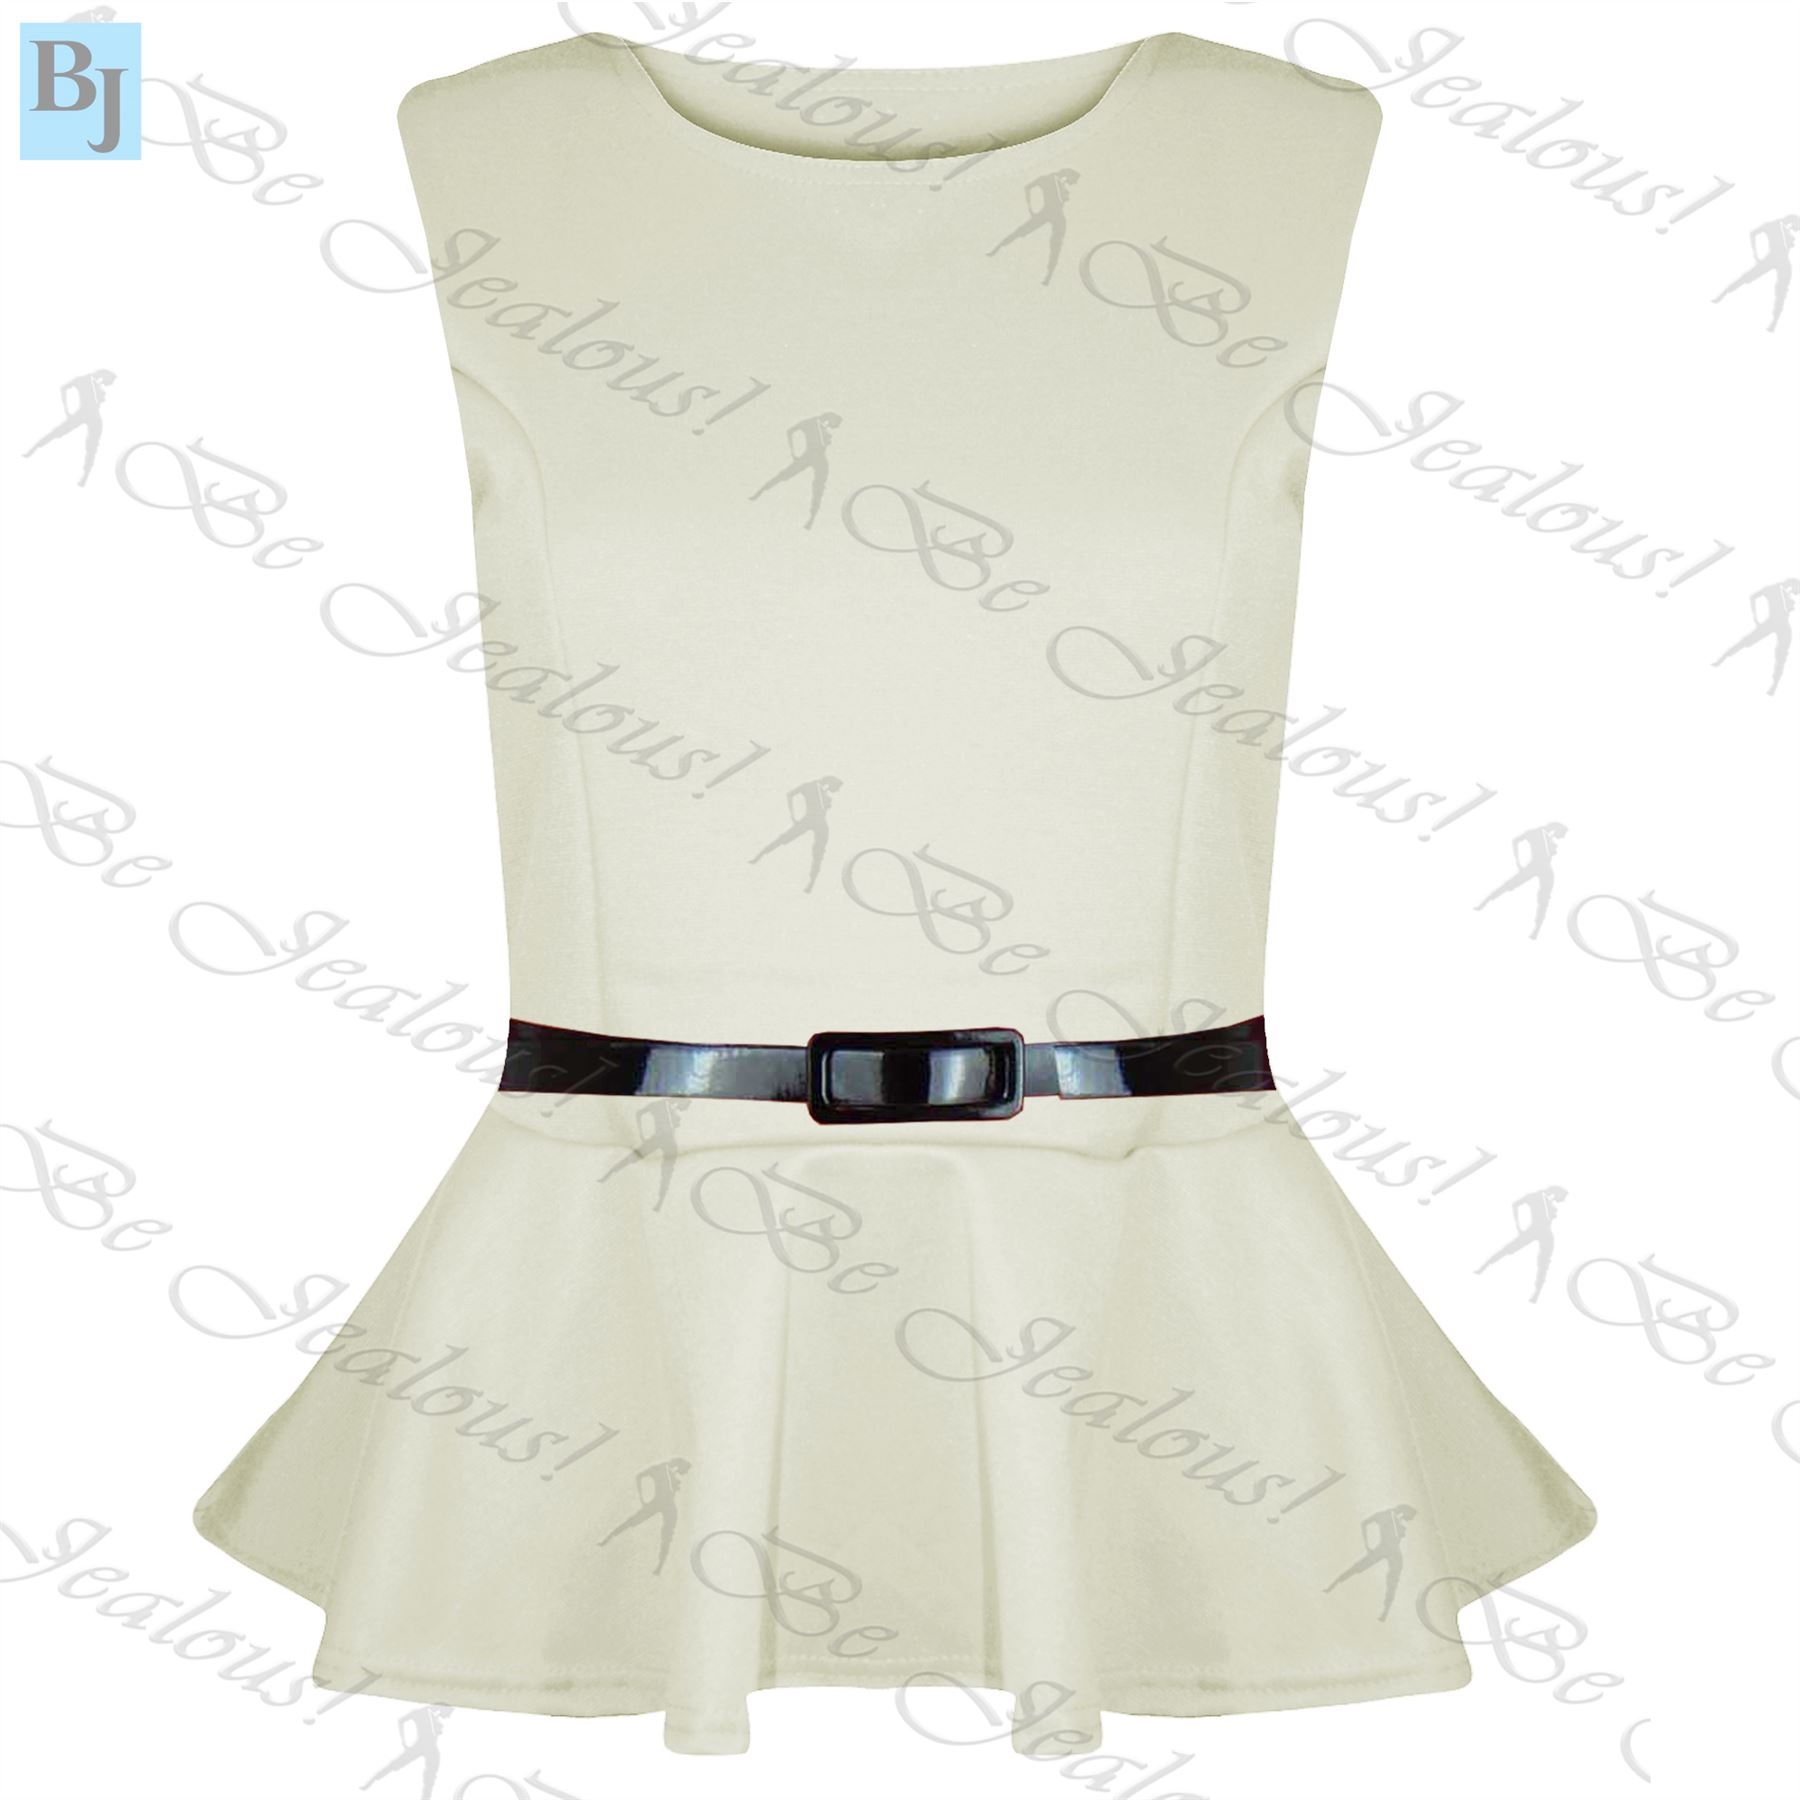 New Womens Plus Size Peplum Top Ladies Sleeveless Belted Frill Skater Mini Dress